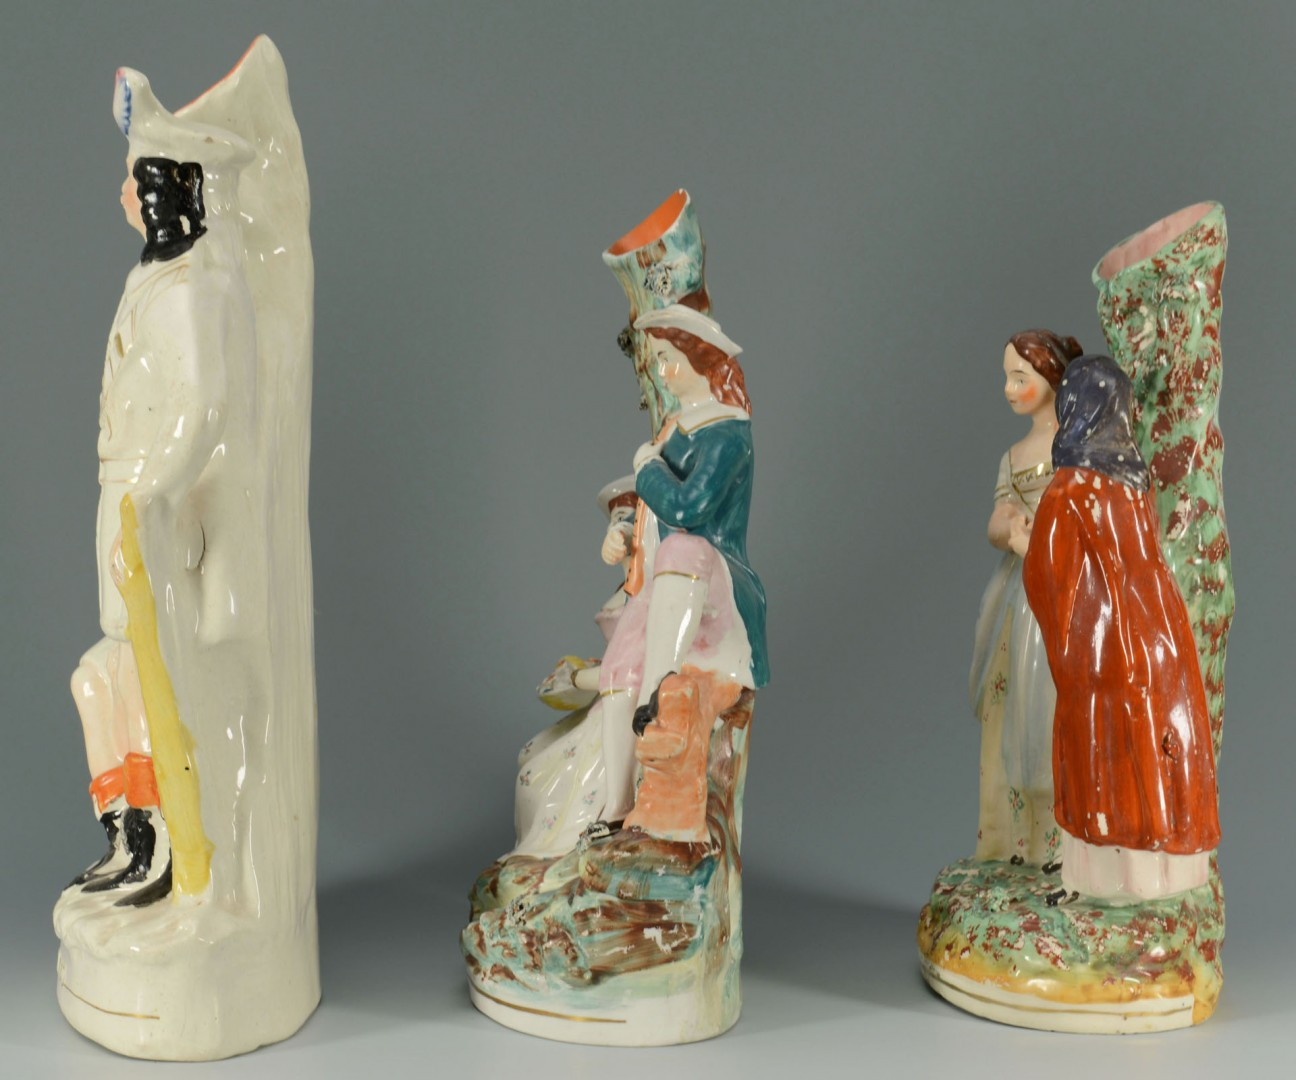 Lot 437: 3 Staffordshire Spill Vase Figural scenes